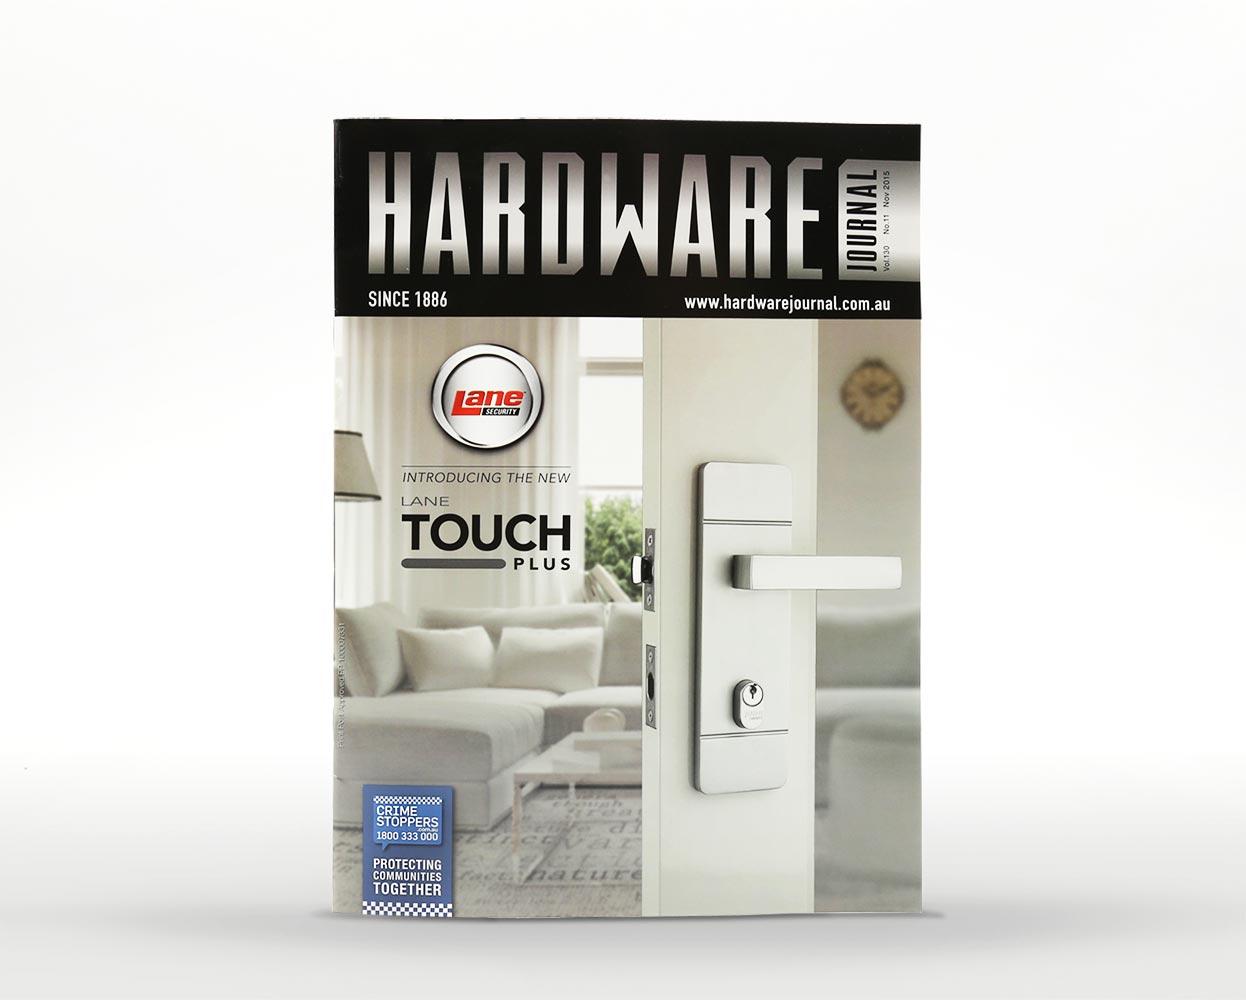 Lane touchplus branding - magazine ad